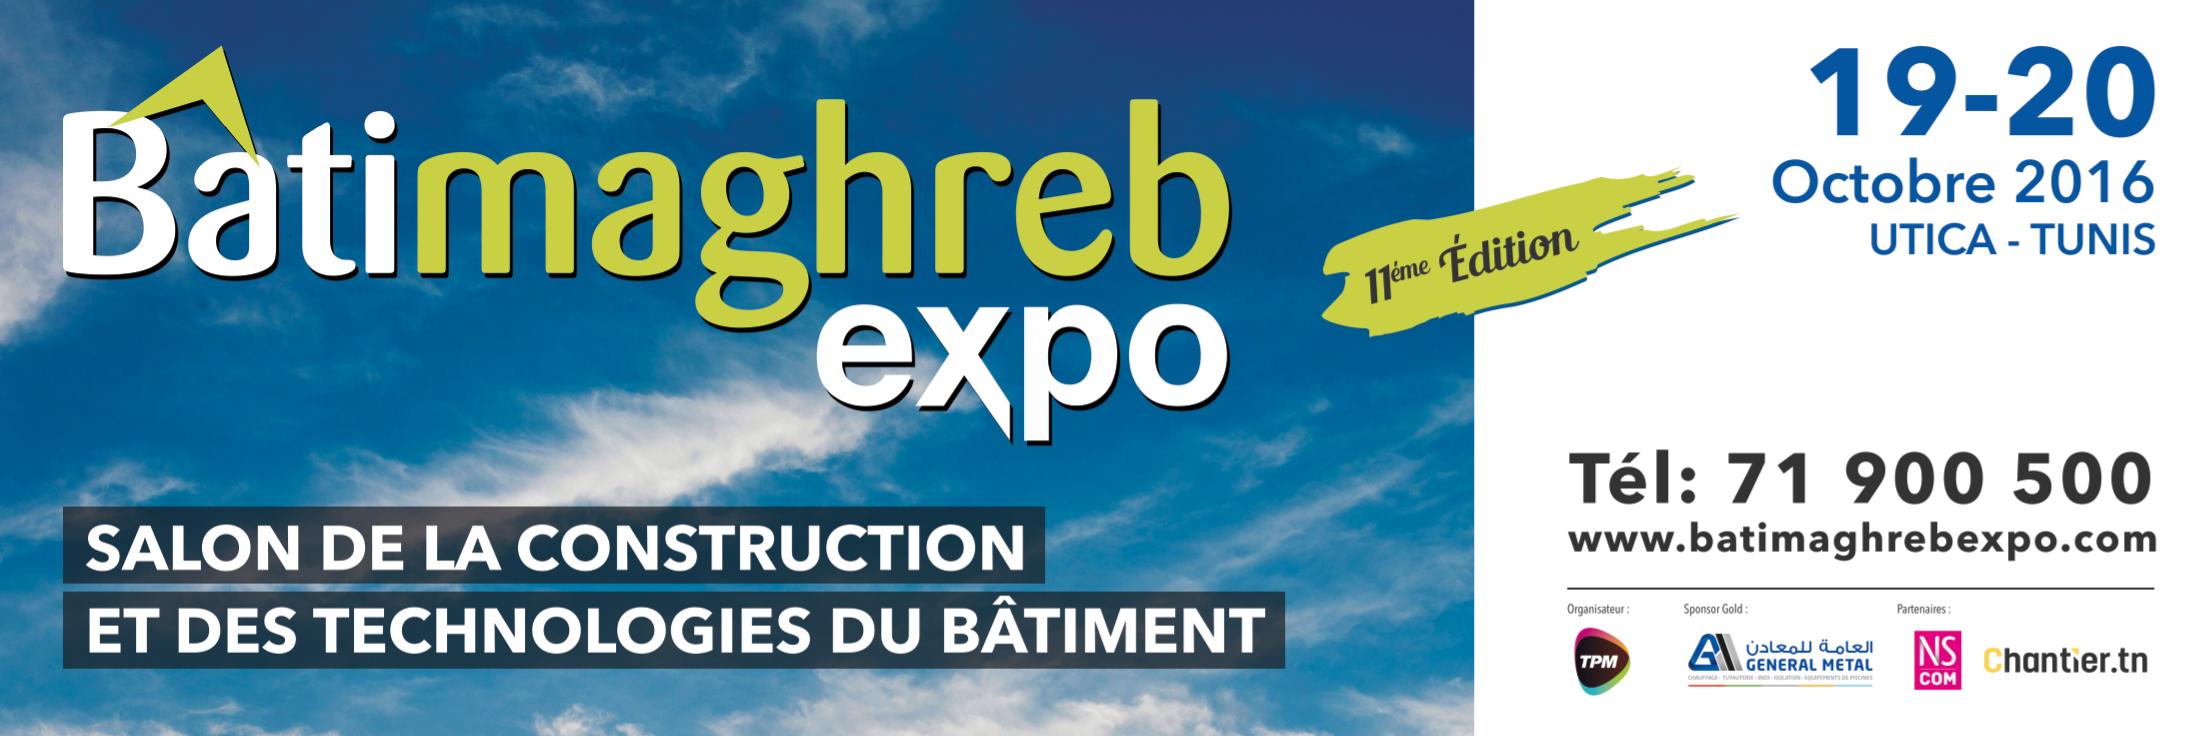 11�me �dition du salon Batimaghreb Expo